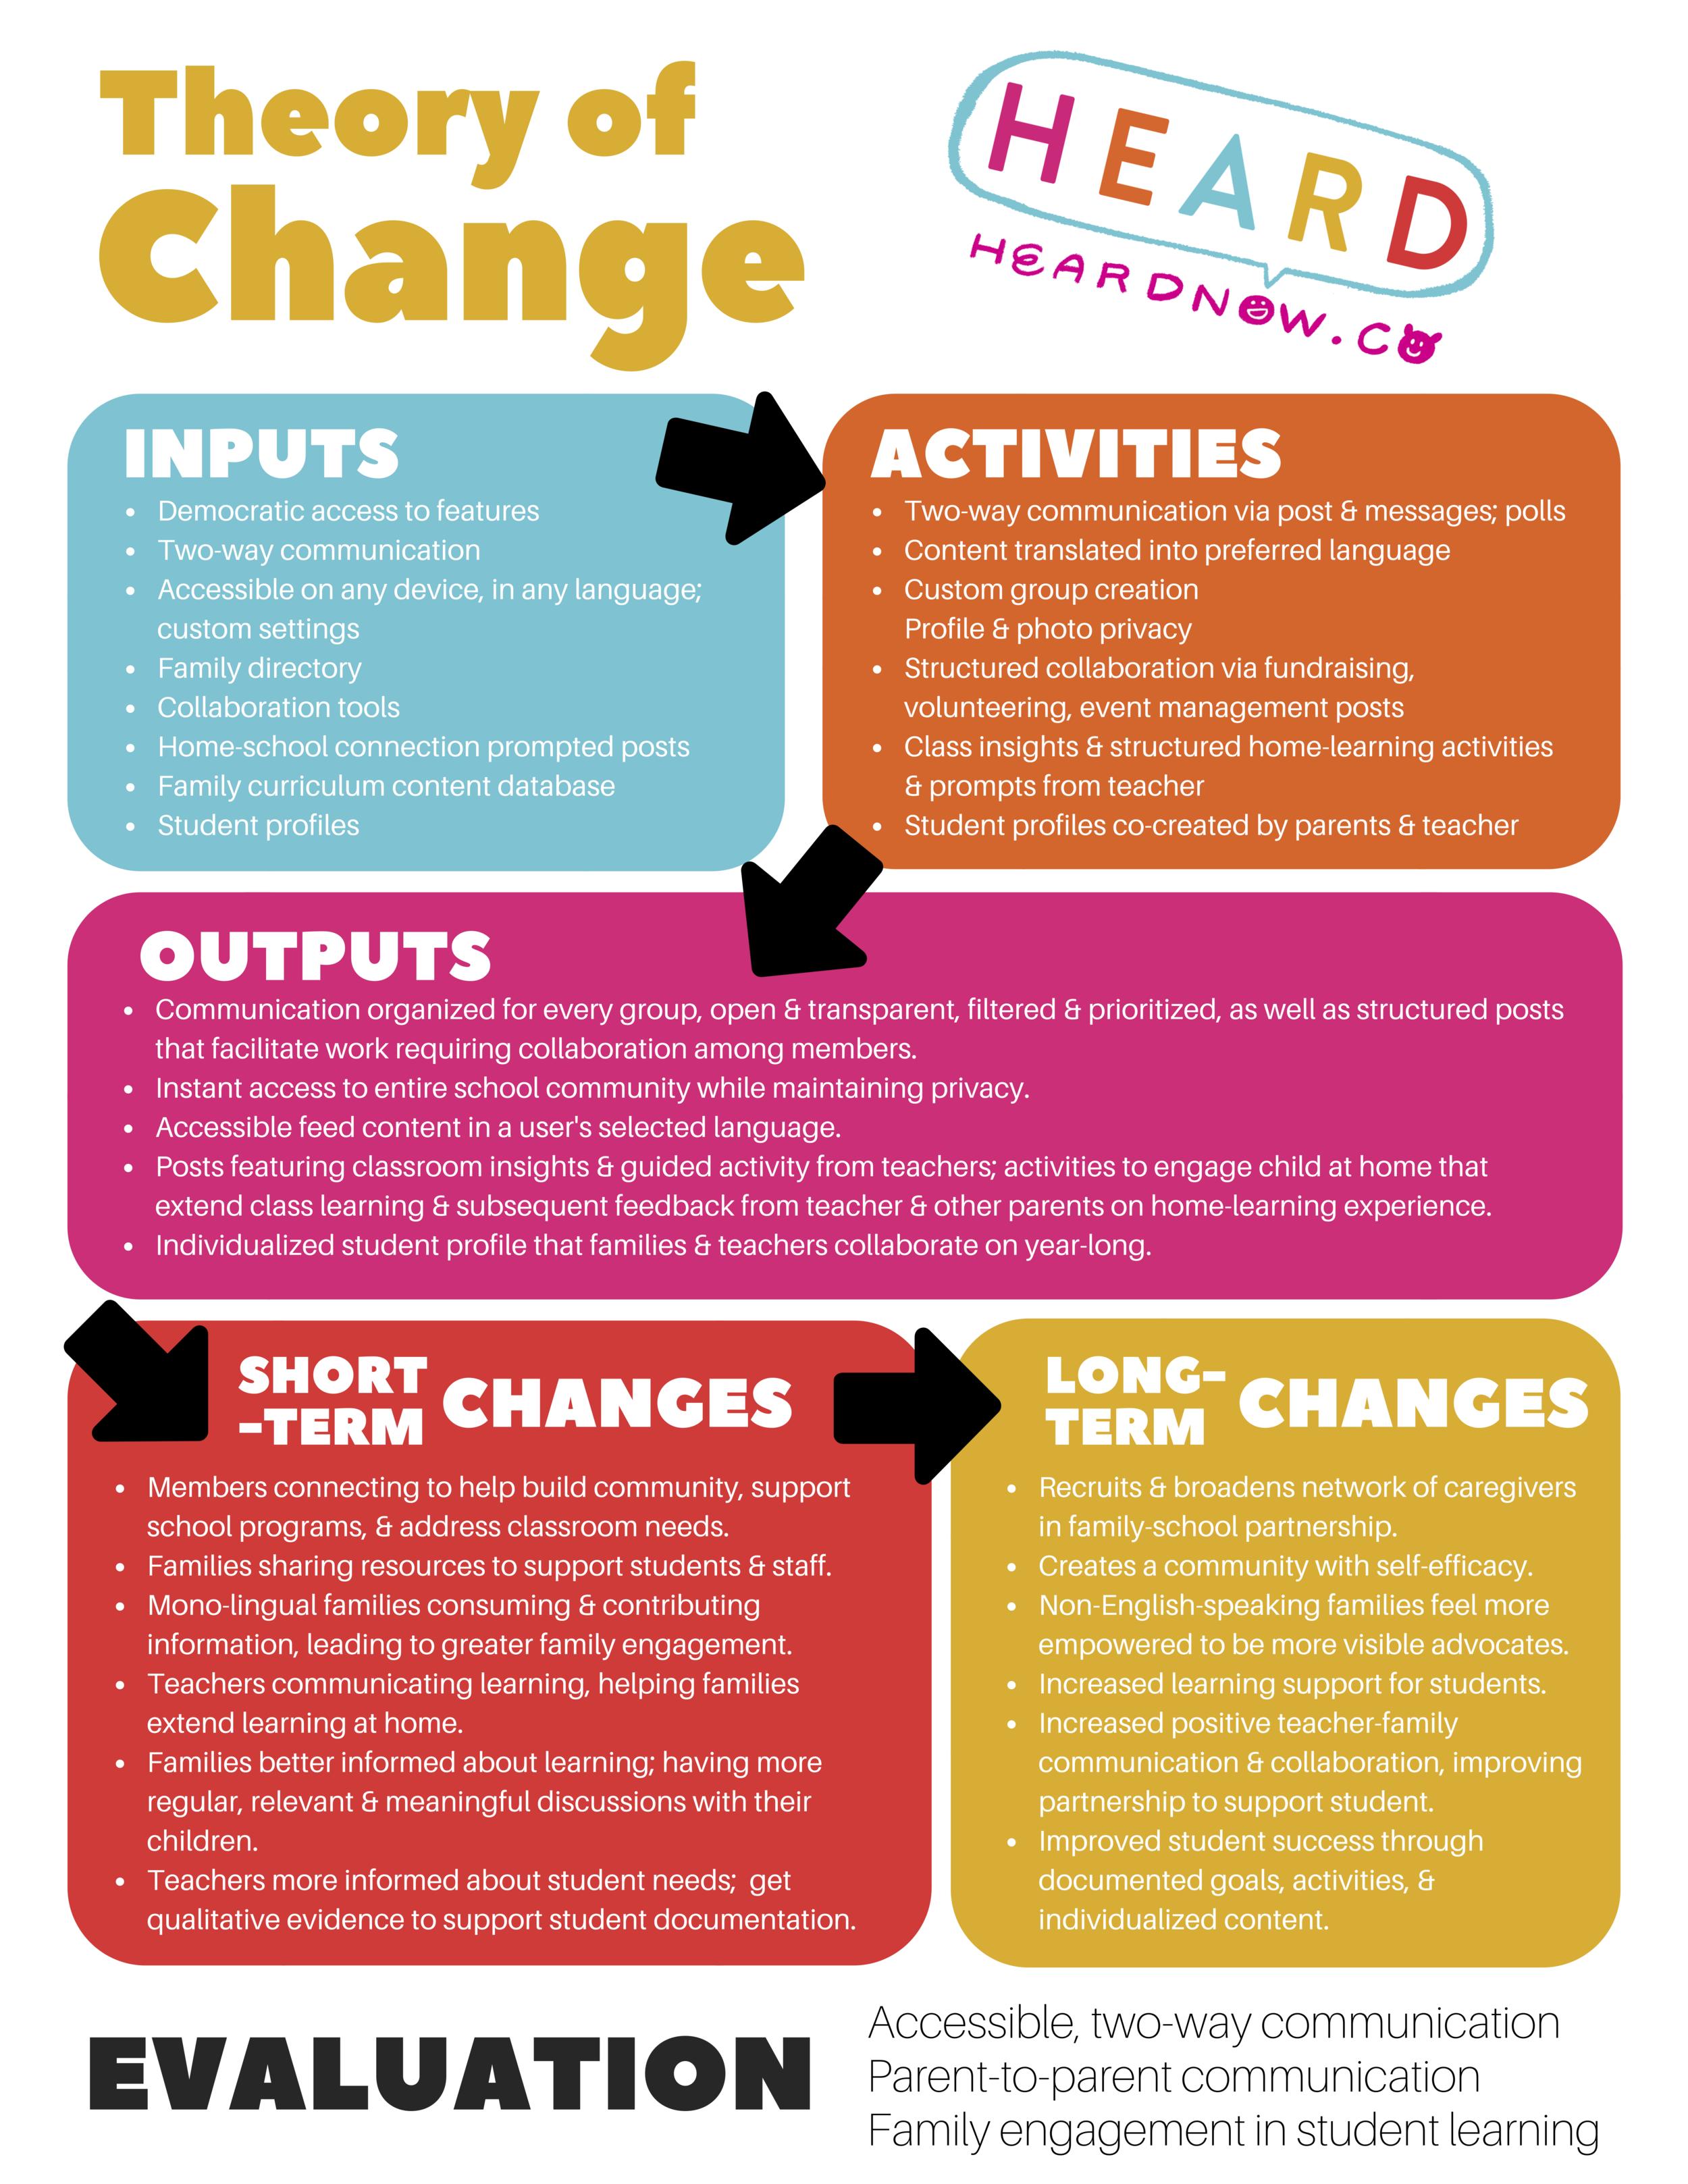 Heard school communication platform / tool - theory of change